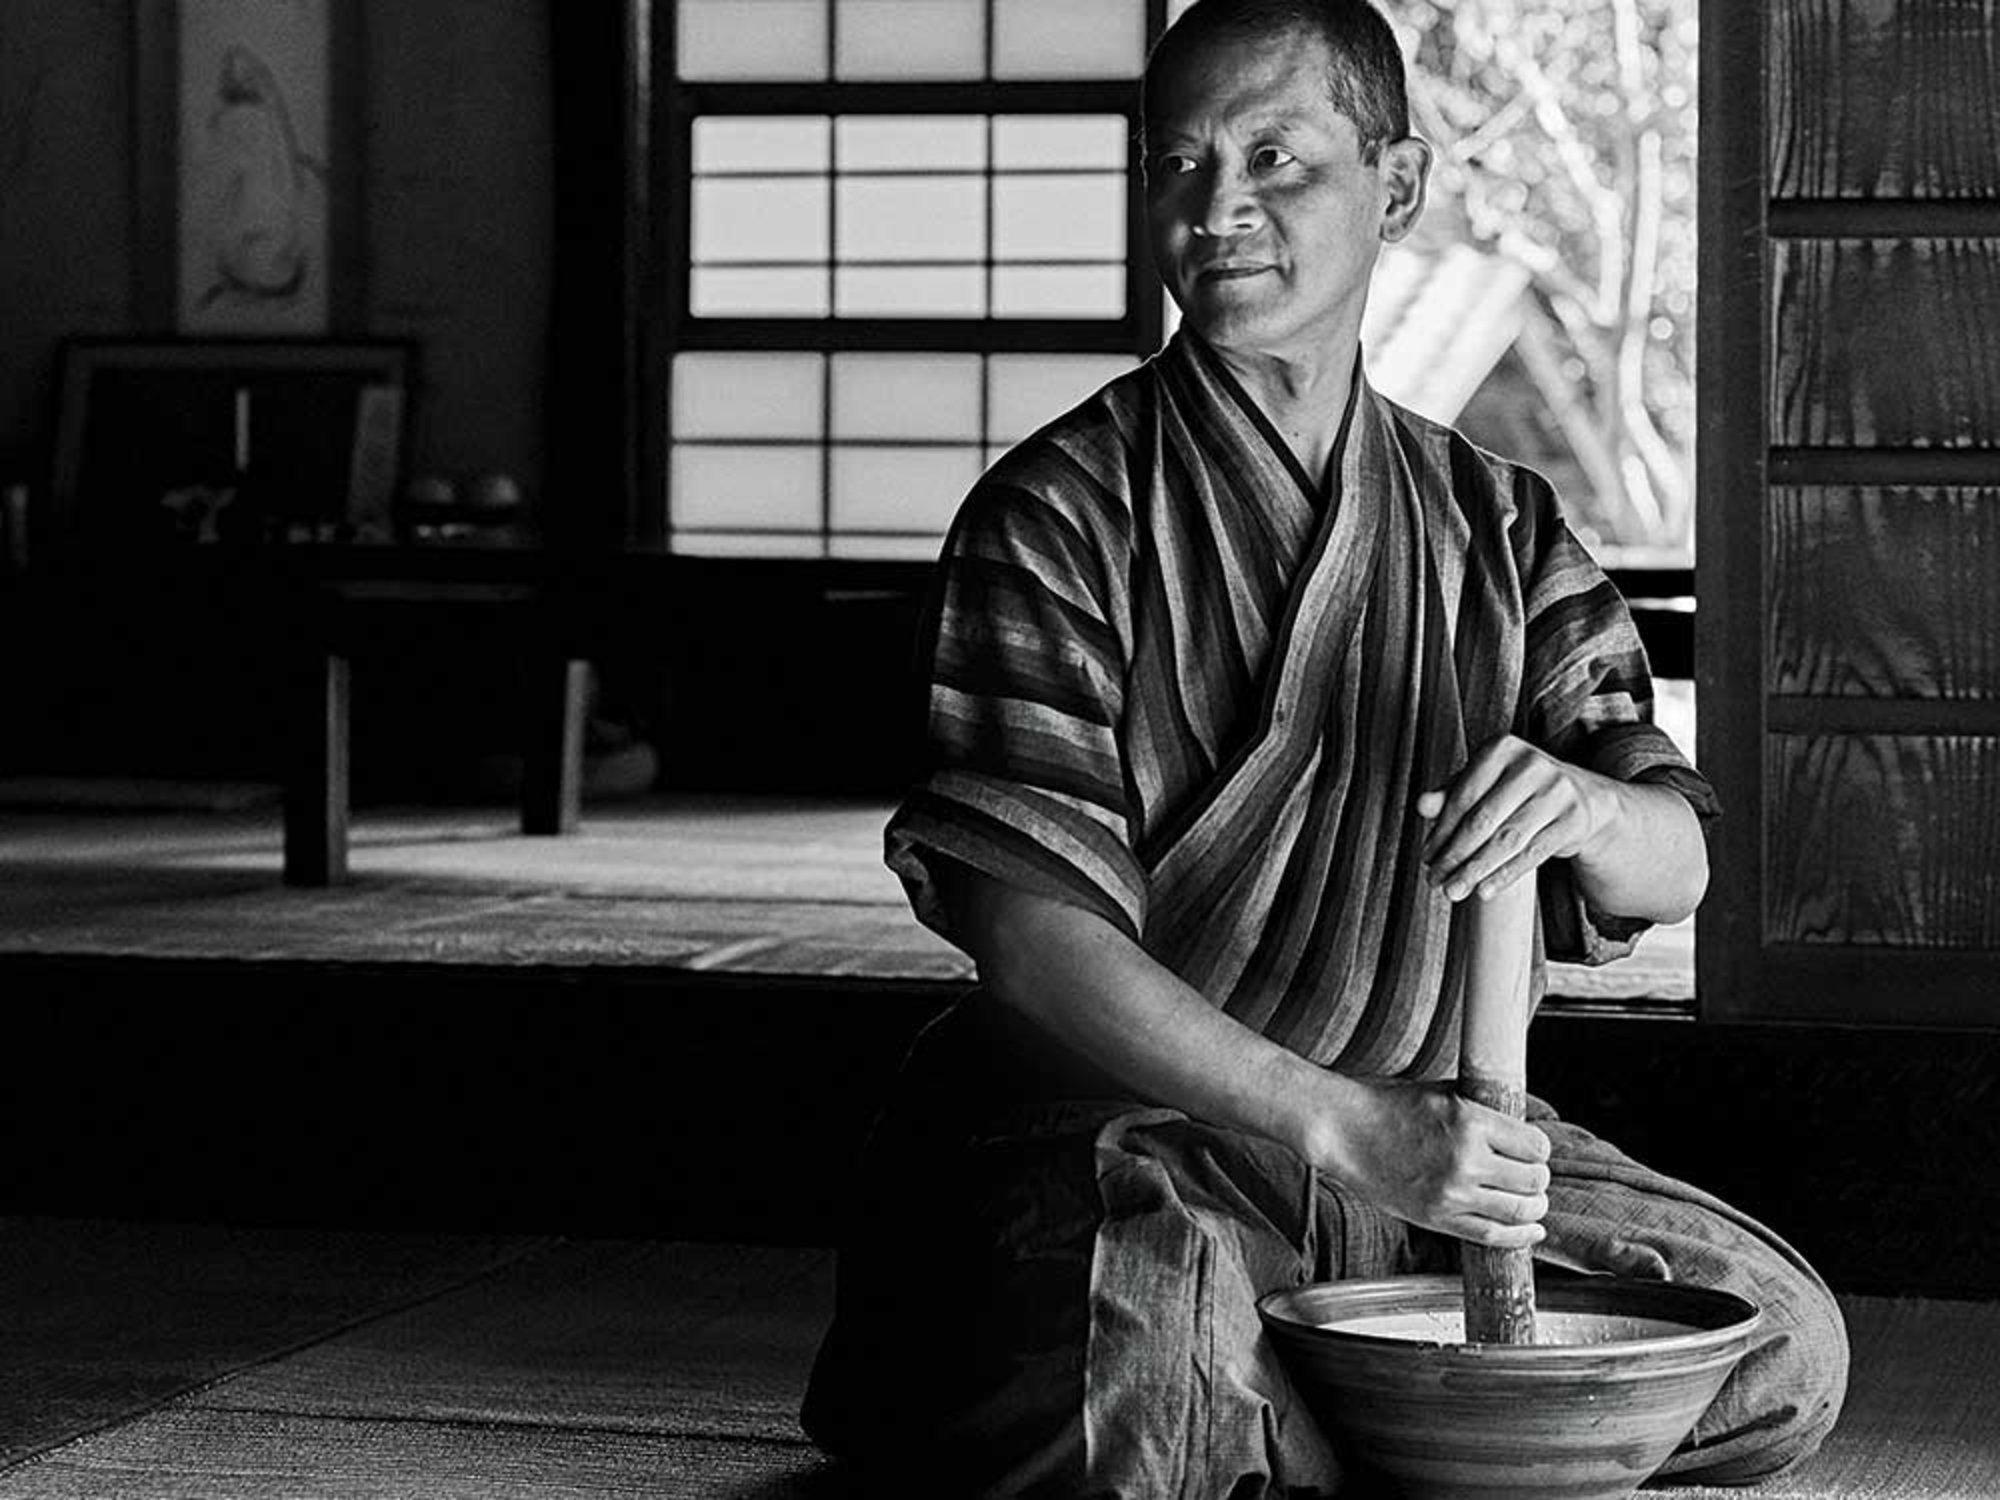 kyoto_buddhist-cuisine_1000x750.jpg